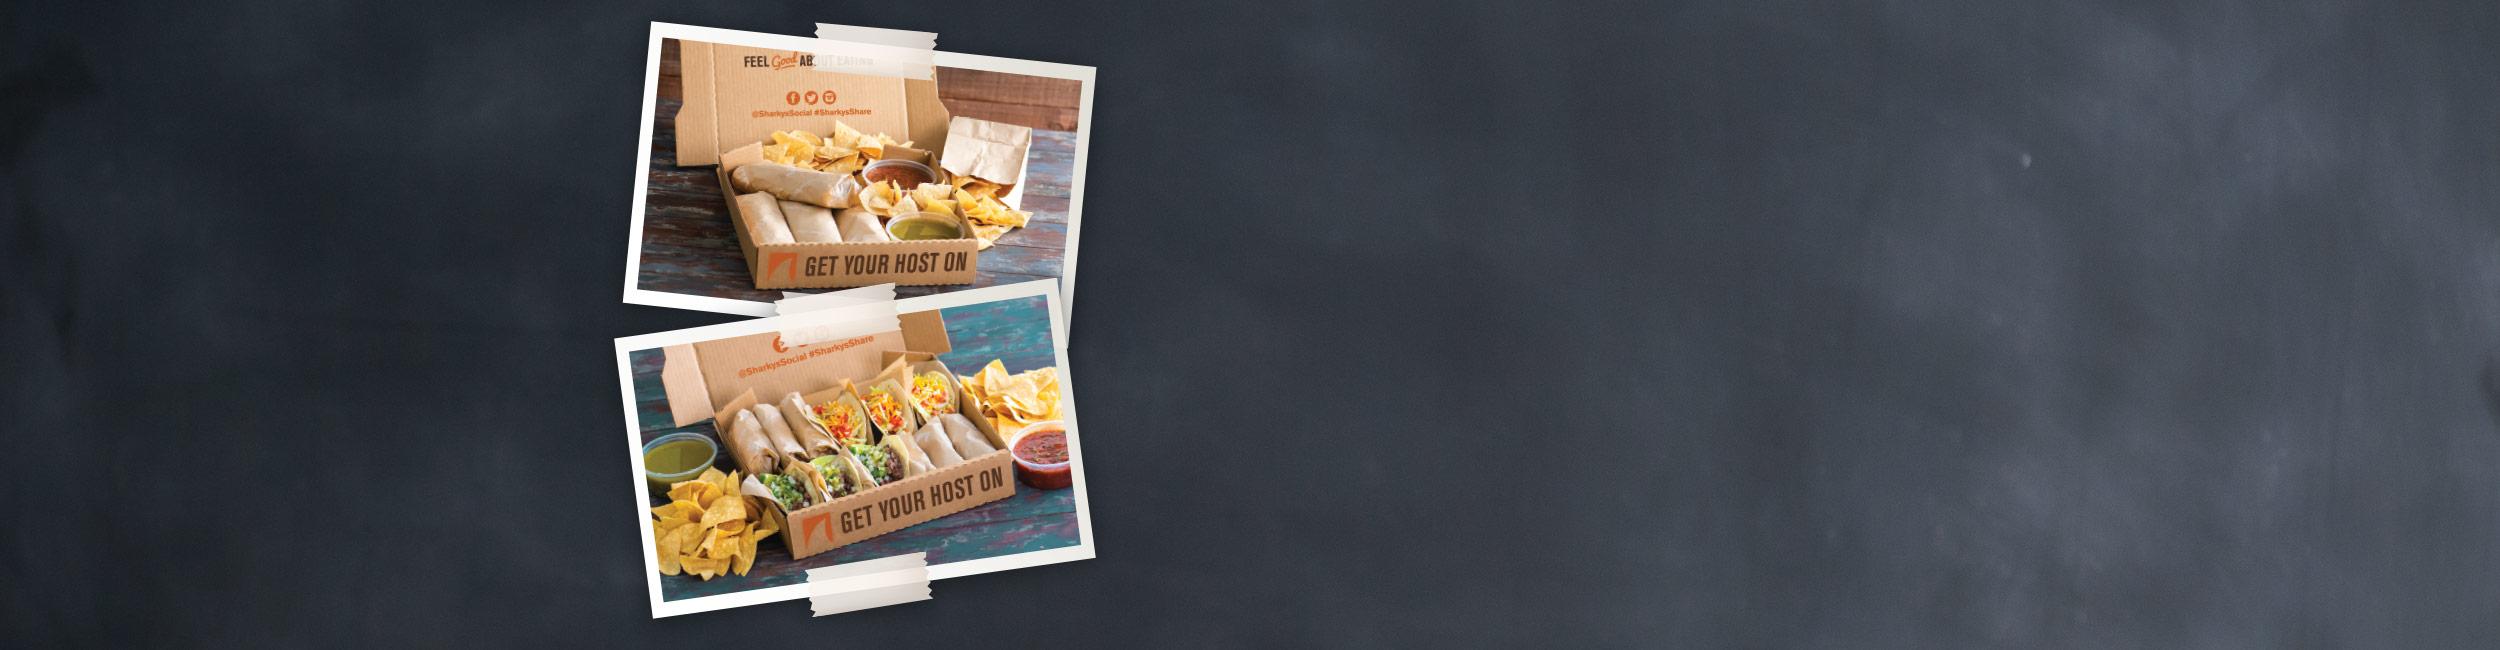 Taco and Burrito Boxes